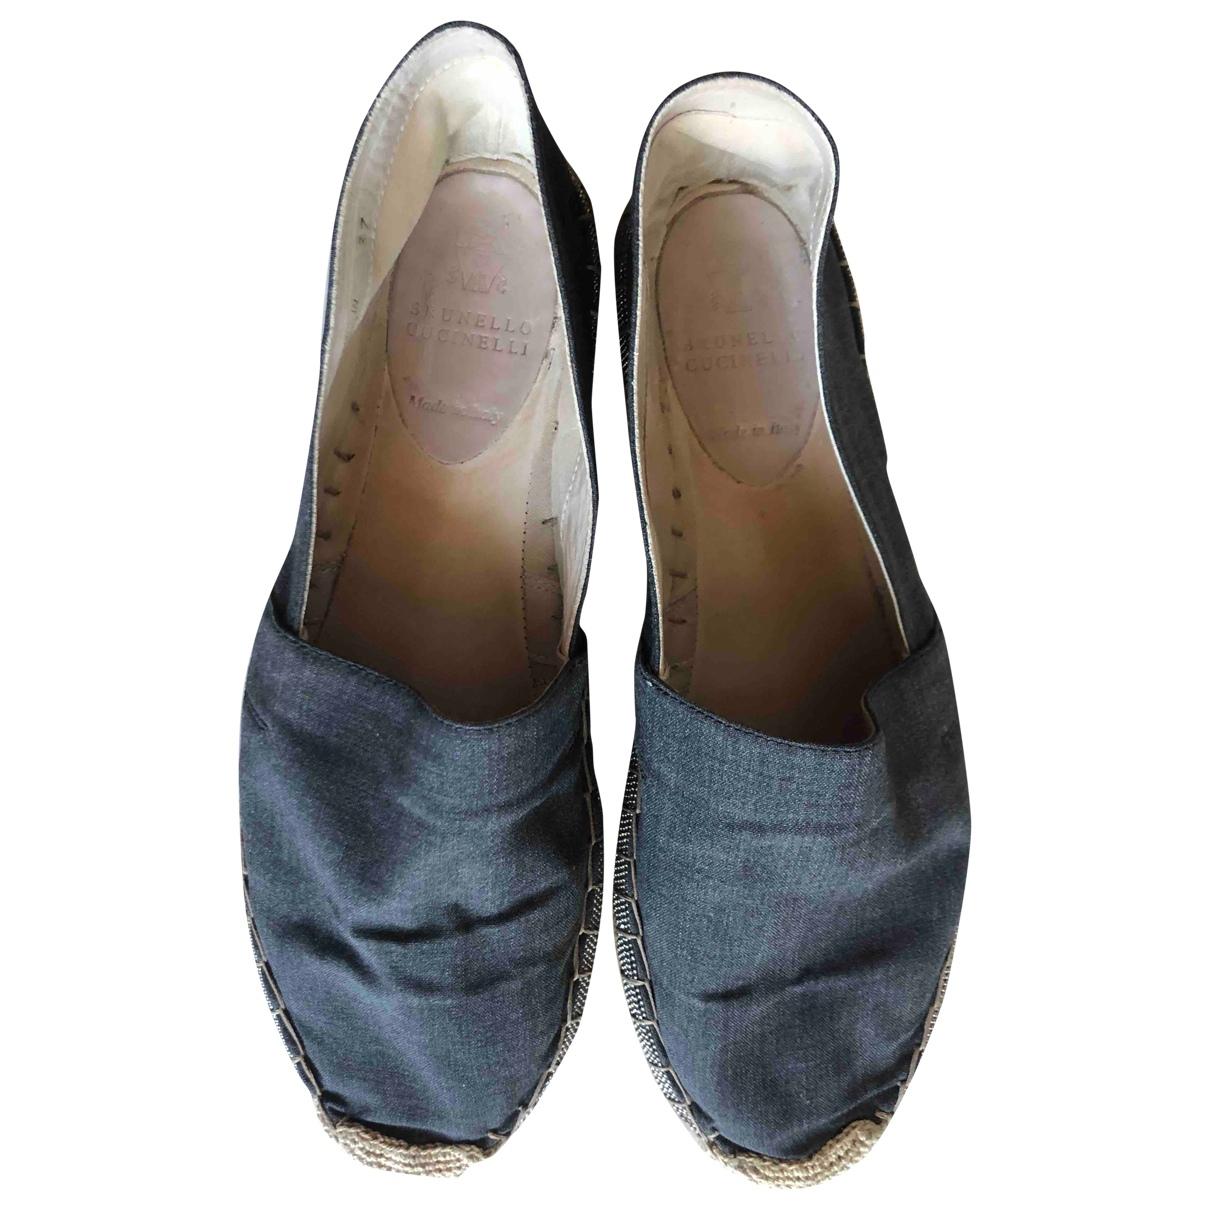 Brunello Cucinelli \N Anthracite Cloth Espadrilles for Women 37 IT